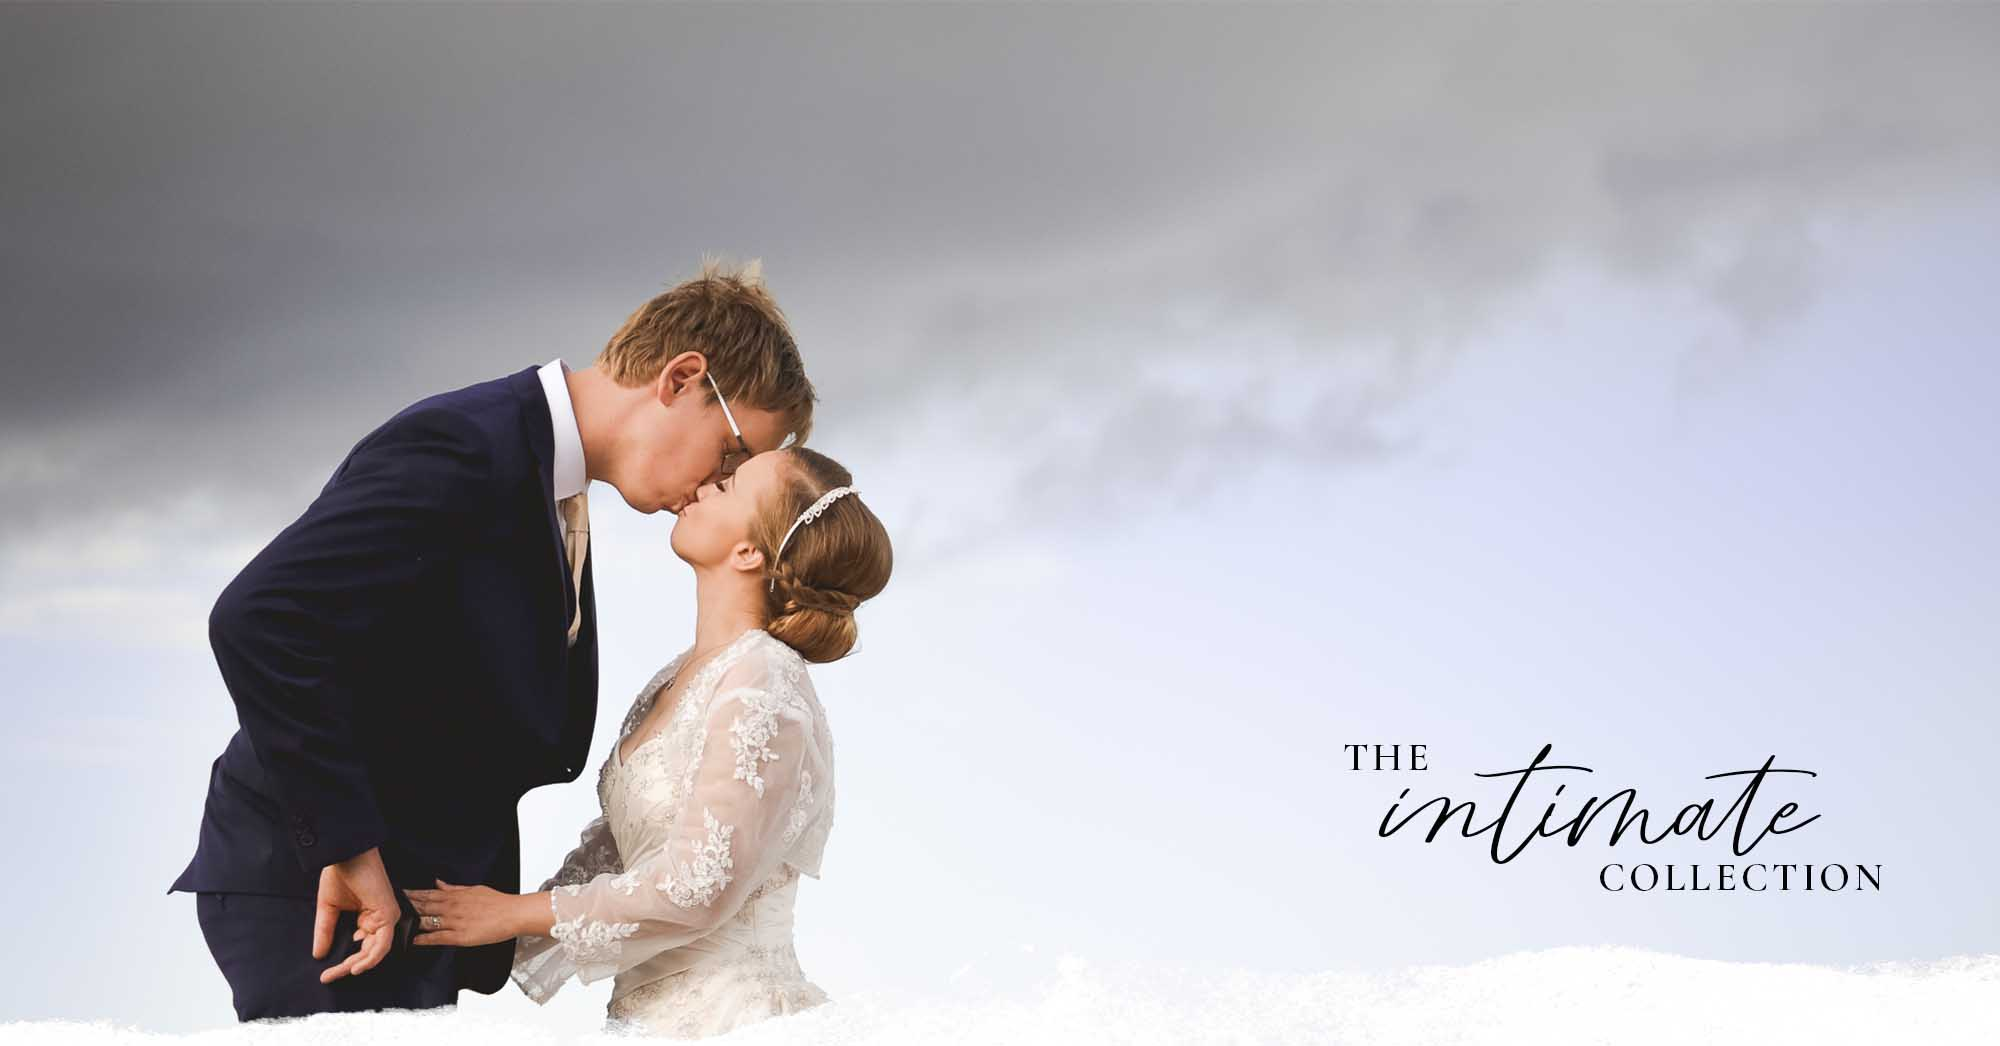 Jeni-Lowe-Wedding-Photogrpahy-Intimate-Collection